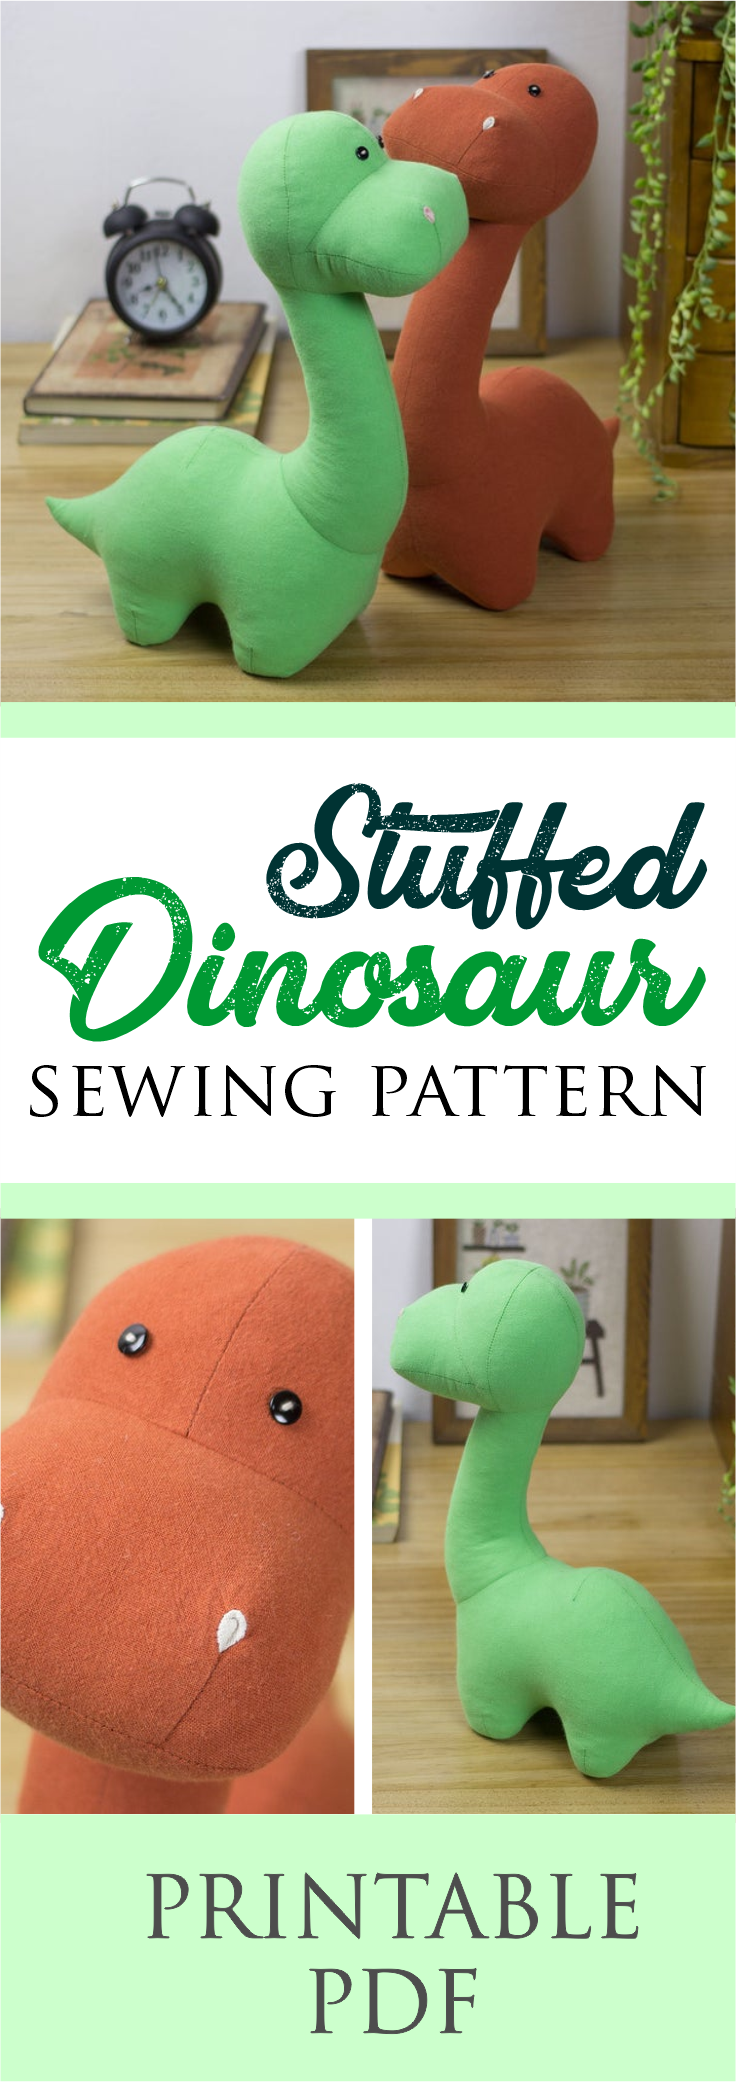 Stuffed Dinosaur Sewing Pattern | Instantly Downloadable PDF